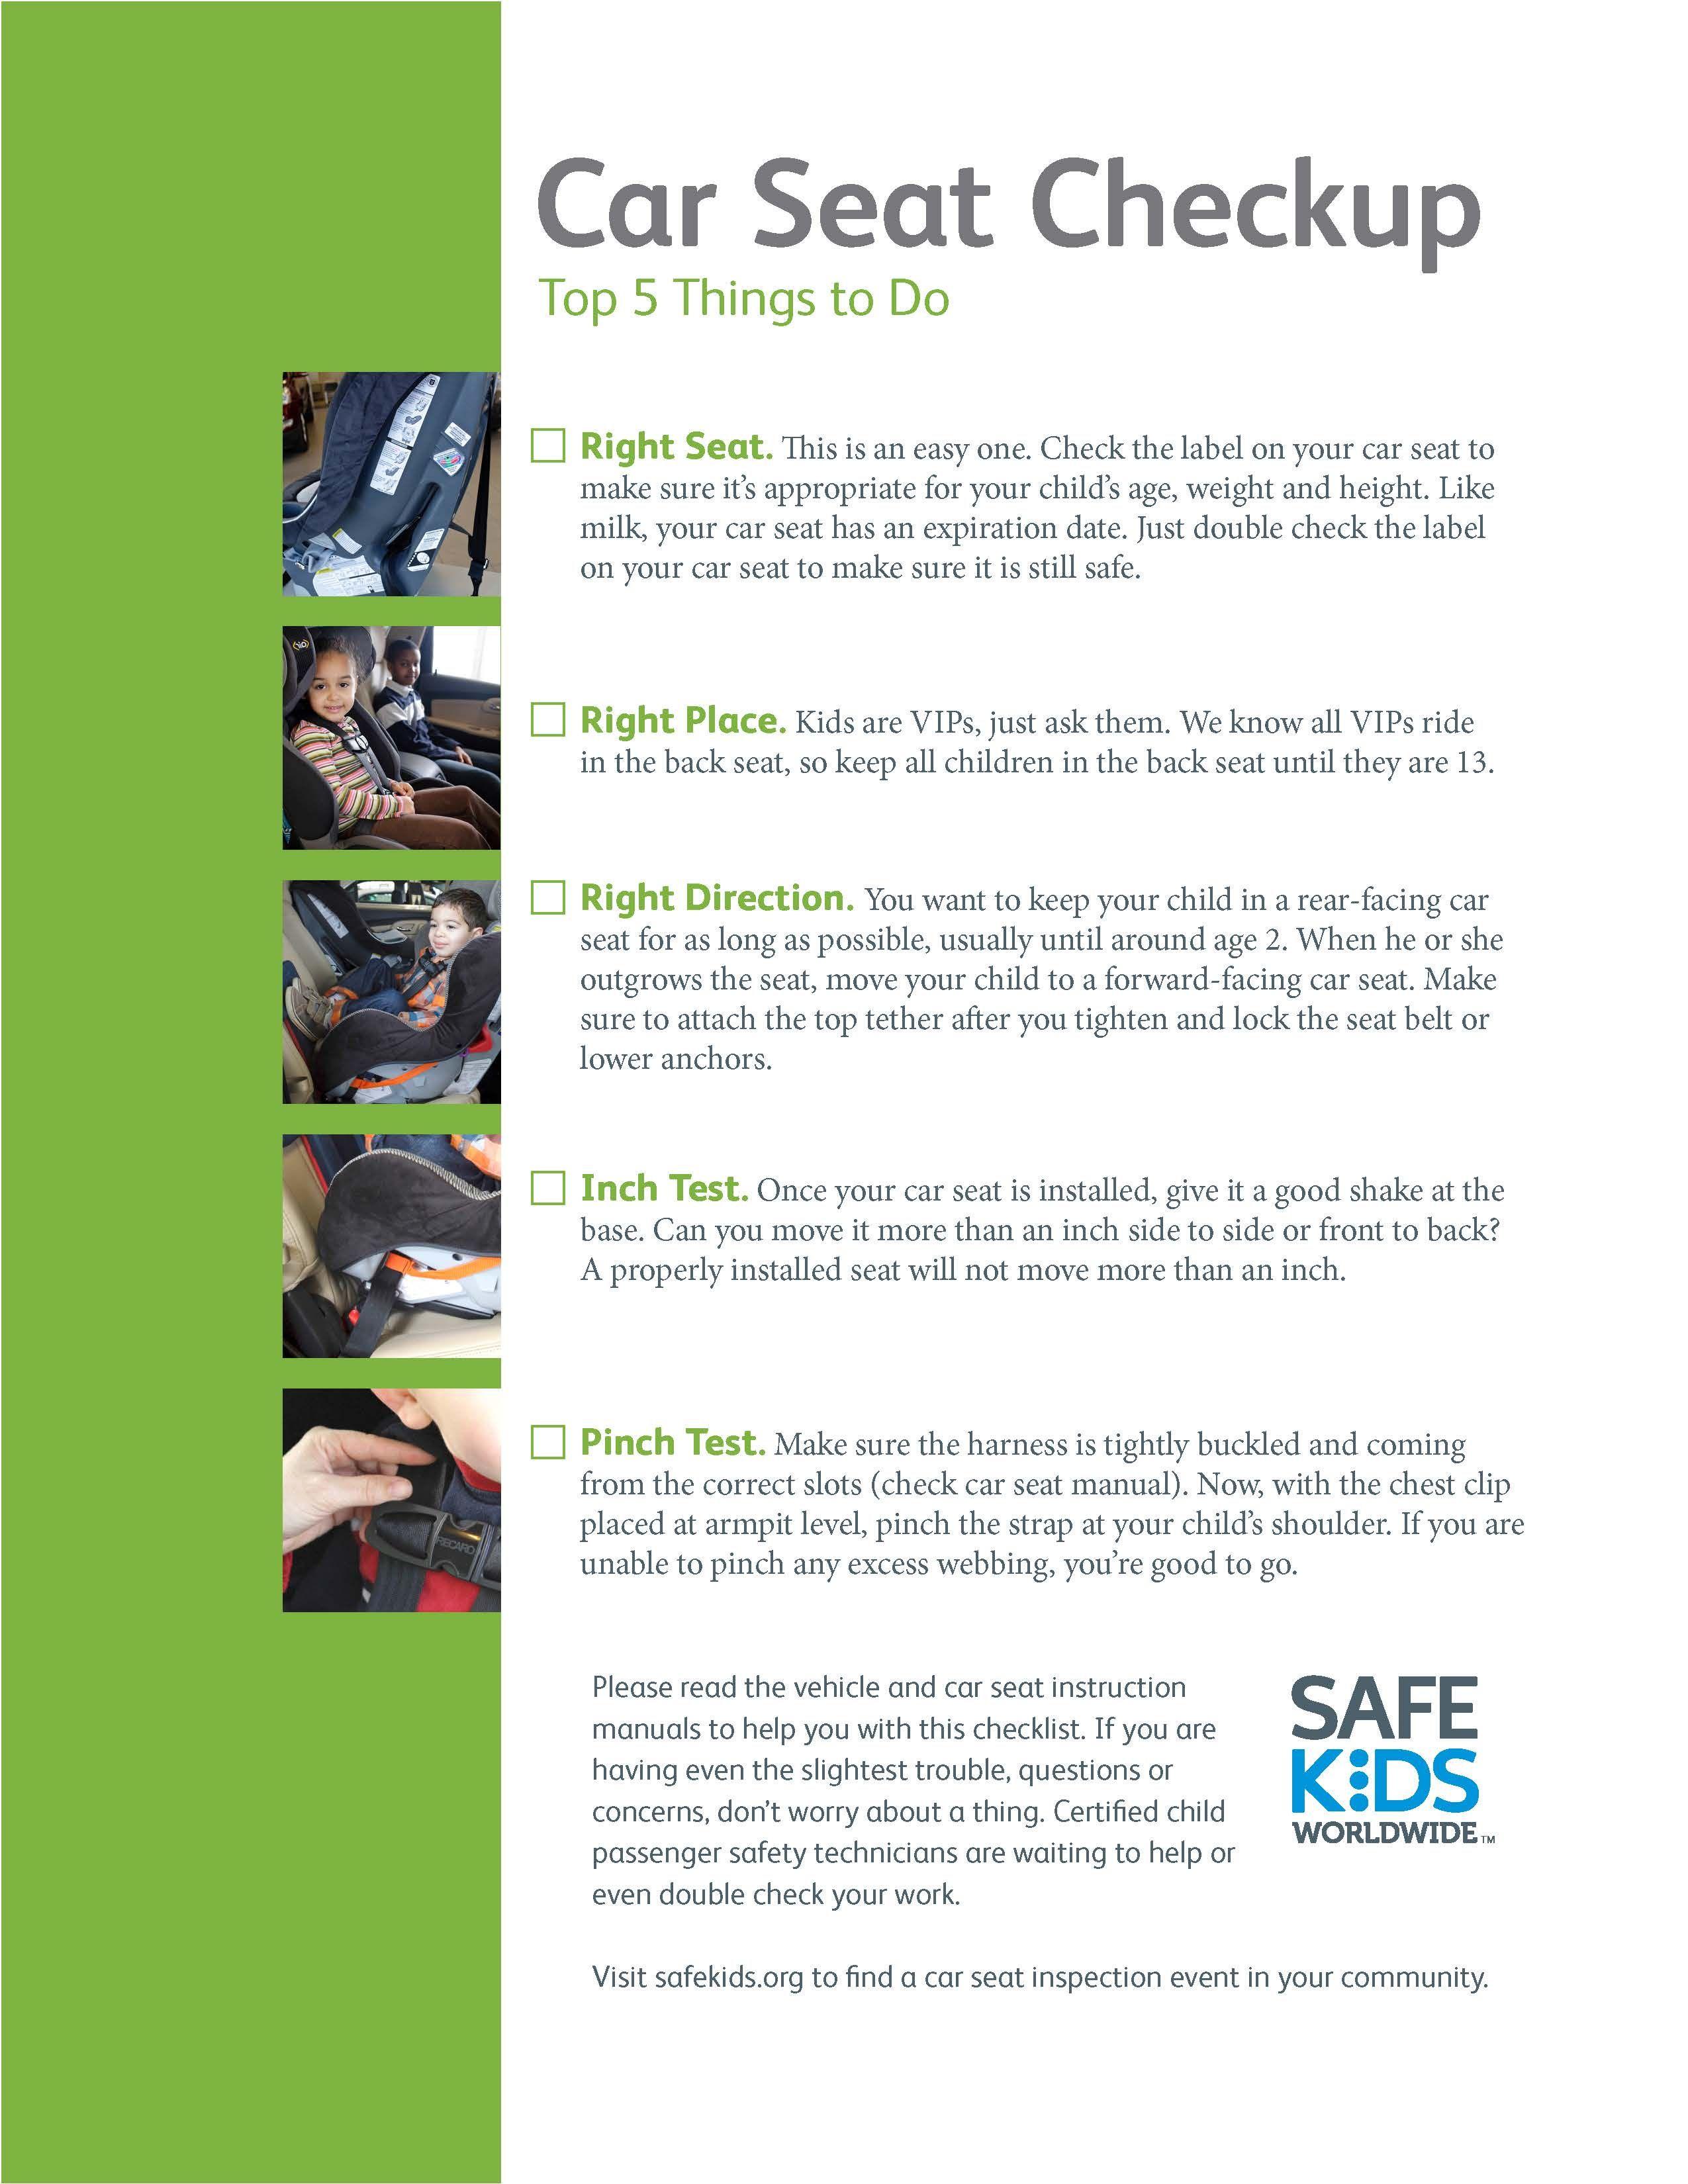 Car Seat Safety Checklist Maternal Newborn Care Pinterest